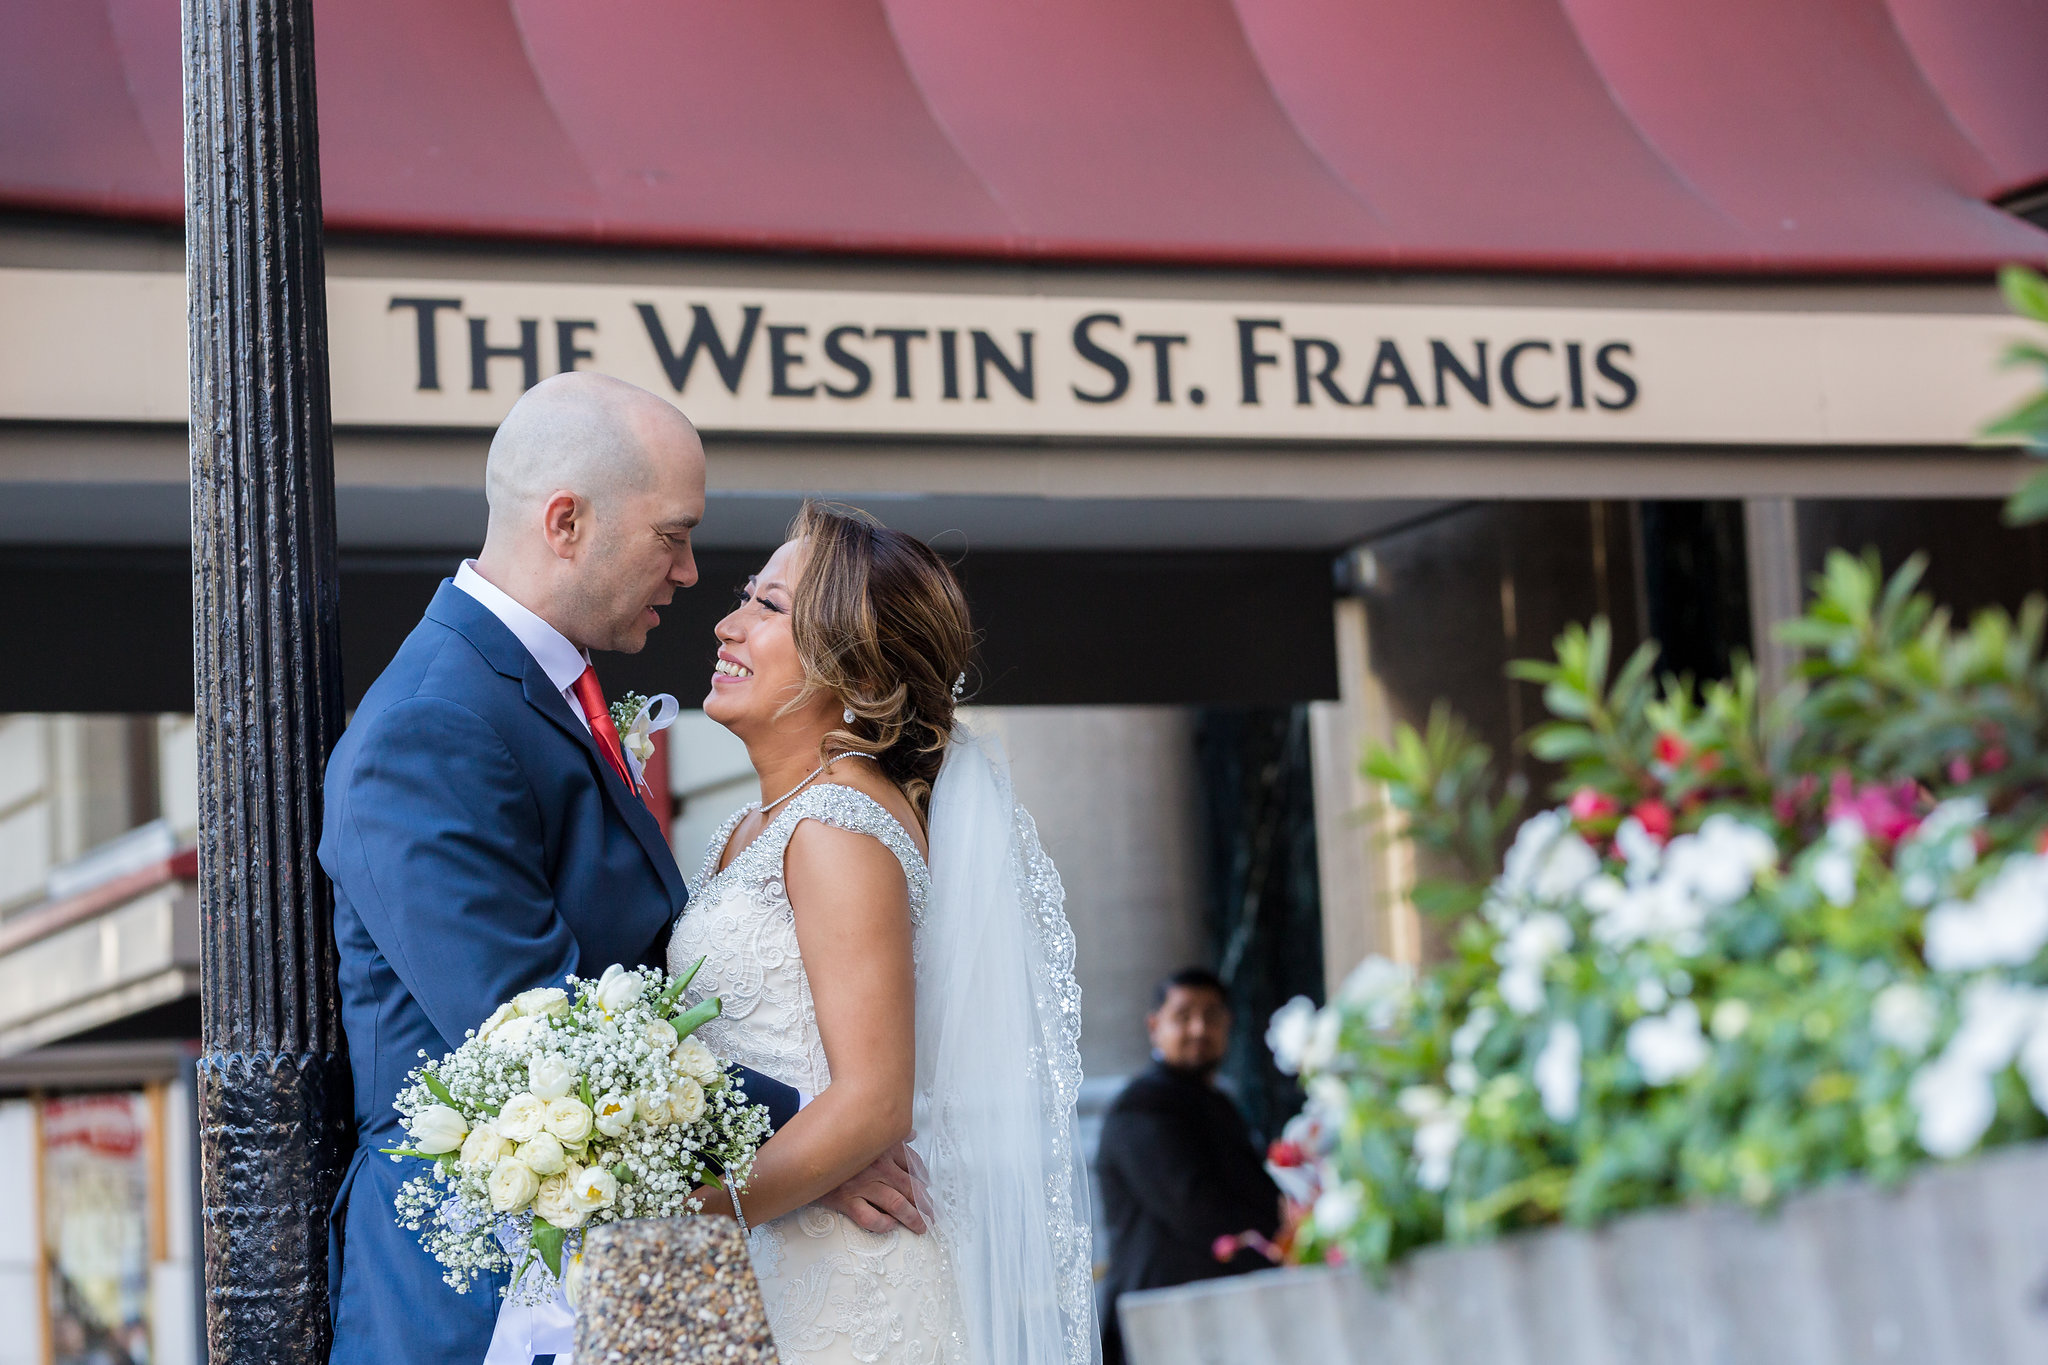 westin st francis wedding photography-17.jpg